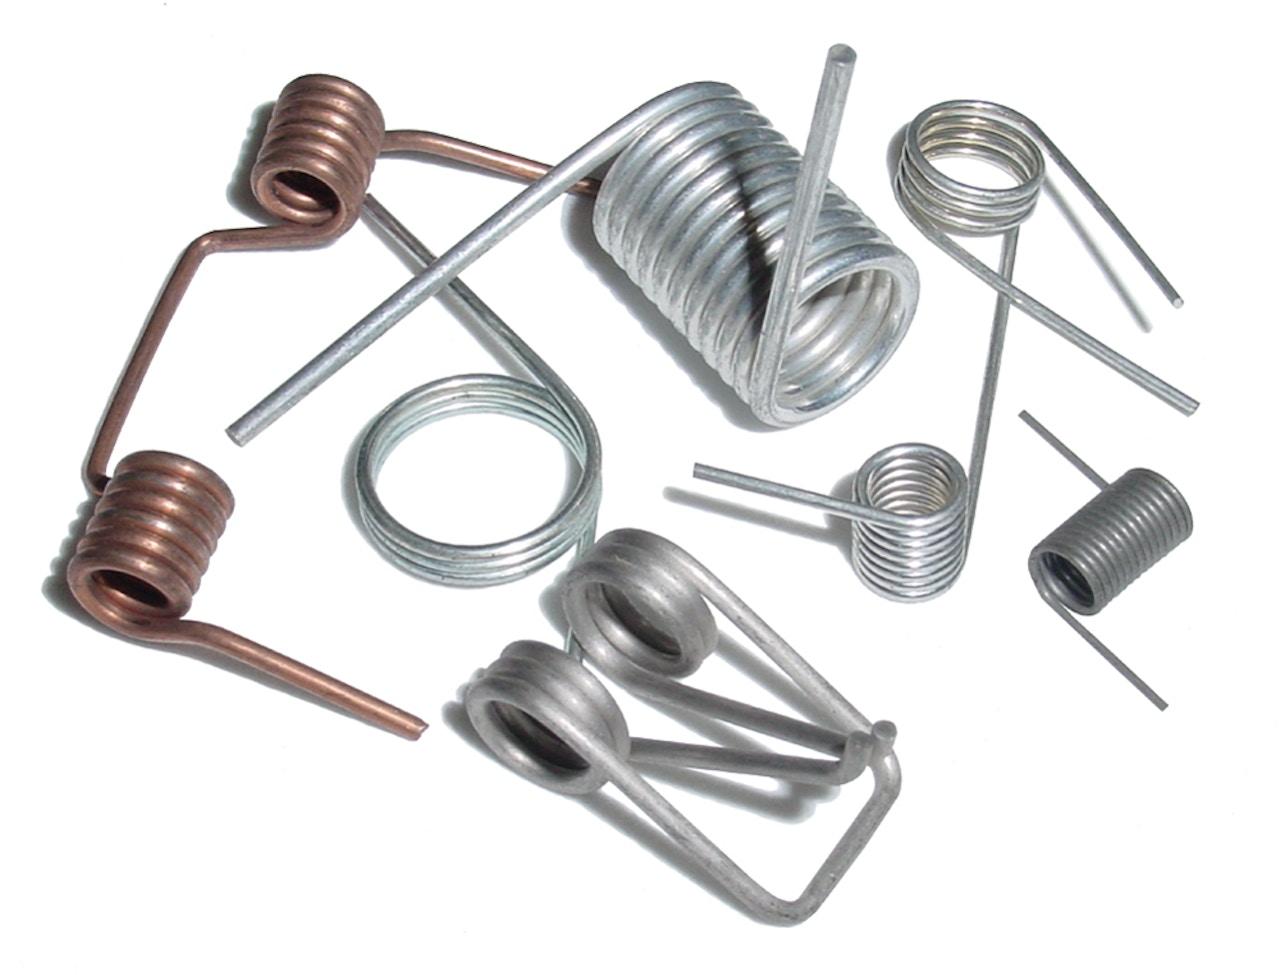 Custom spring components - Torsion springs